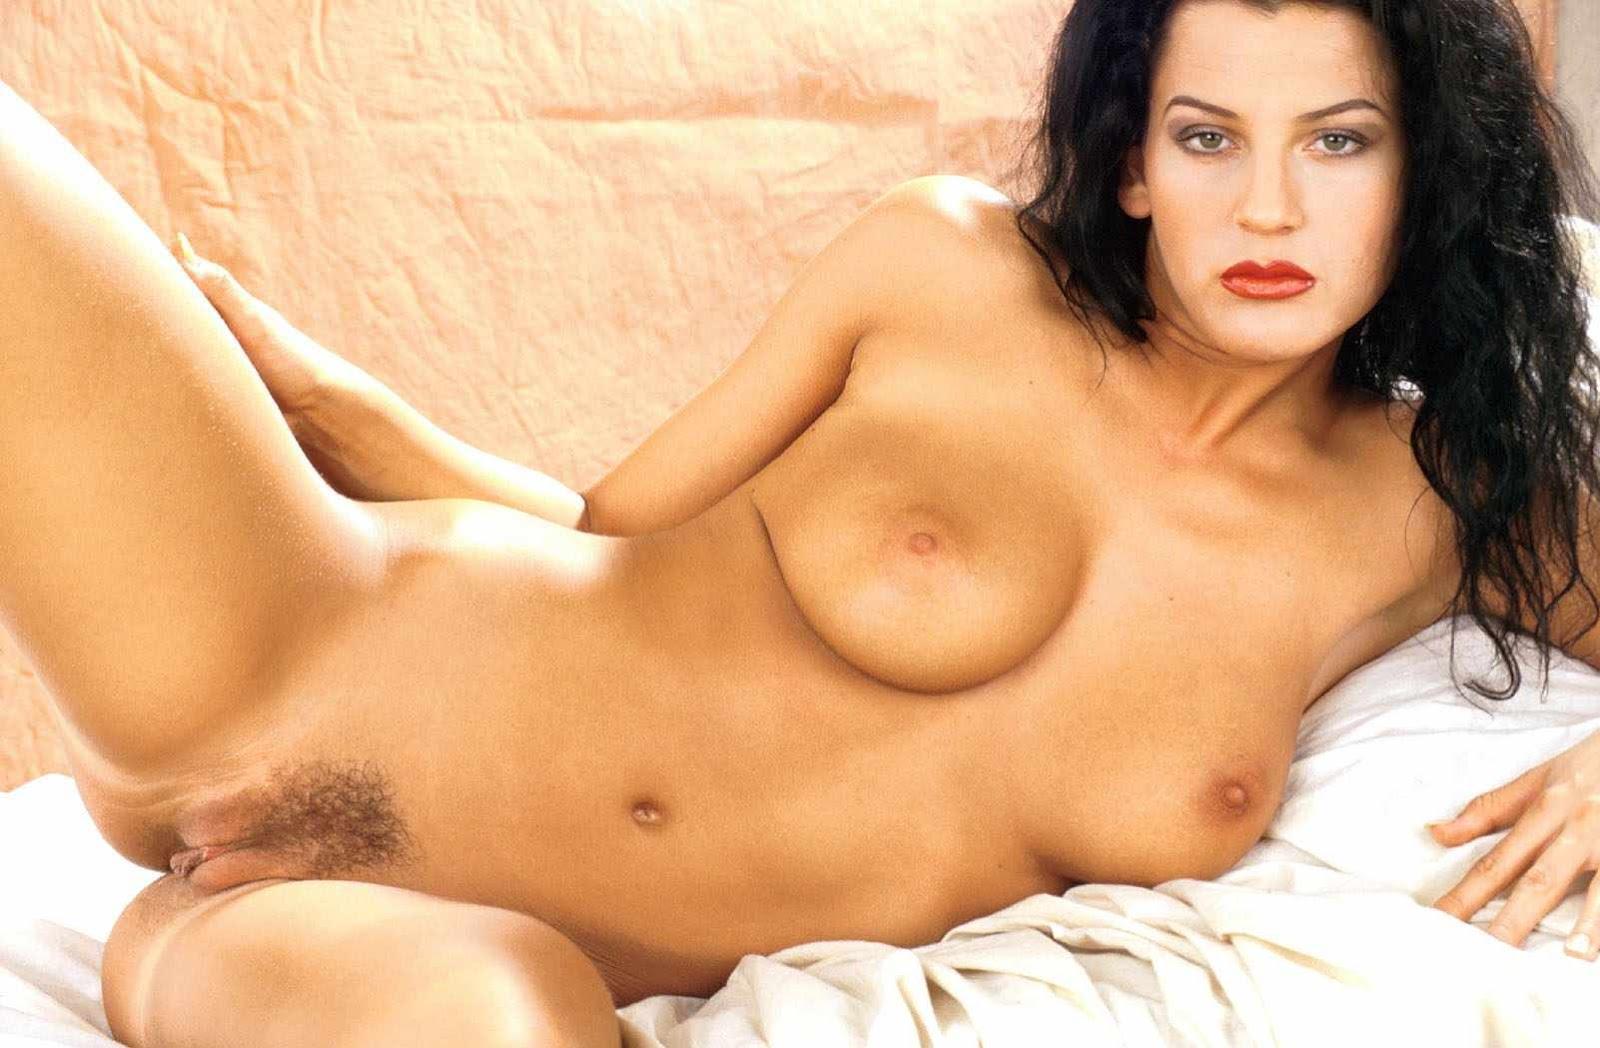 Sex Mona naked (23 photo), Tits, Paparazzi, Selfie, cleavage 2017